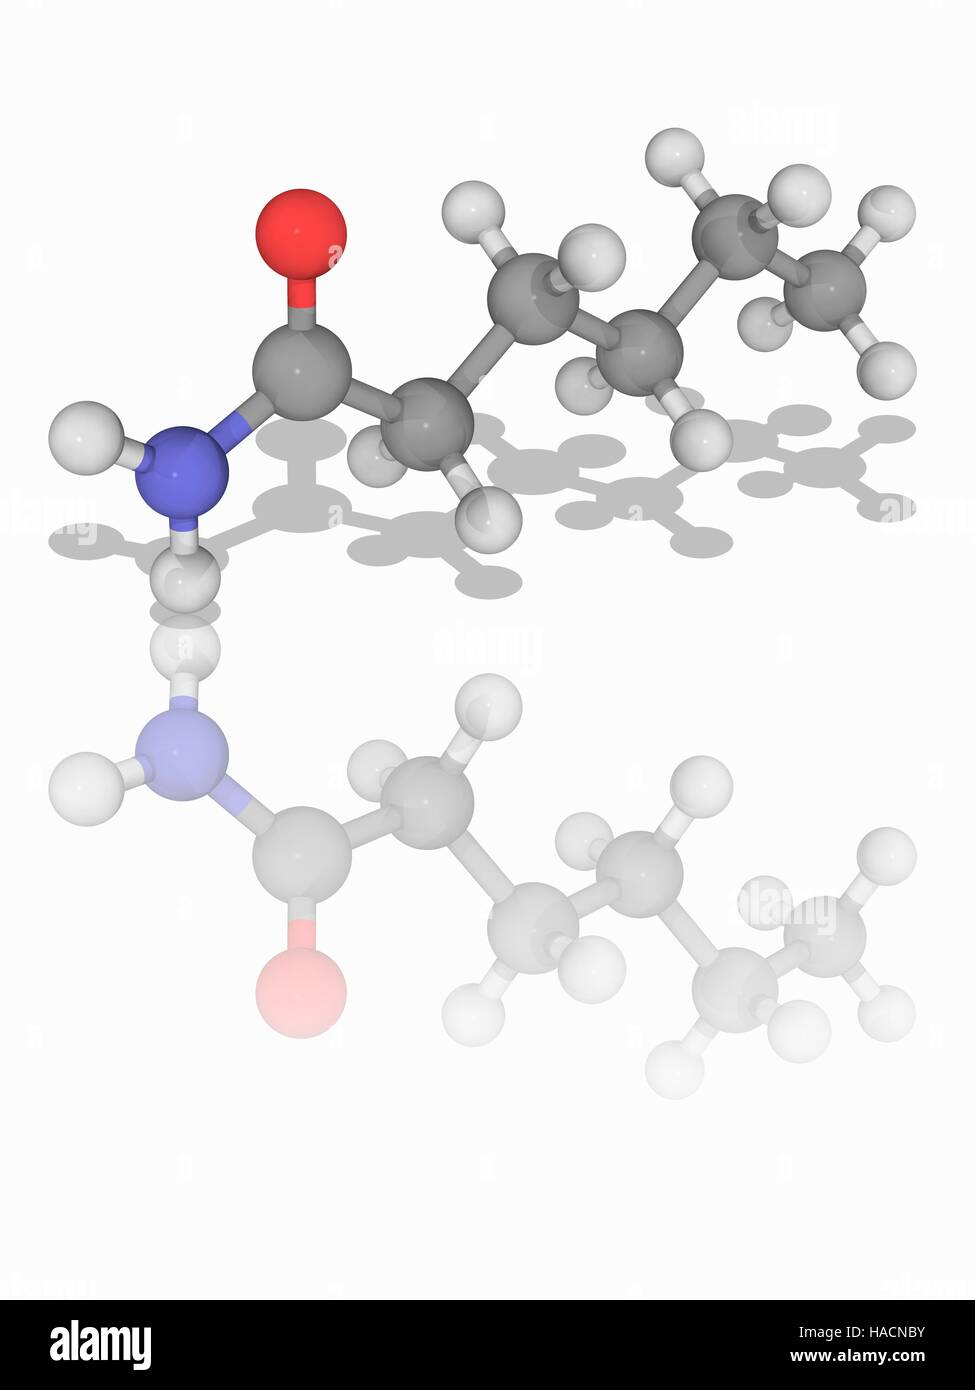 Hexanamide Molekülmodell Der Organischen Verbindung Und